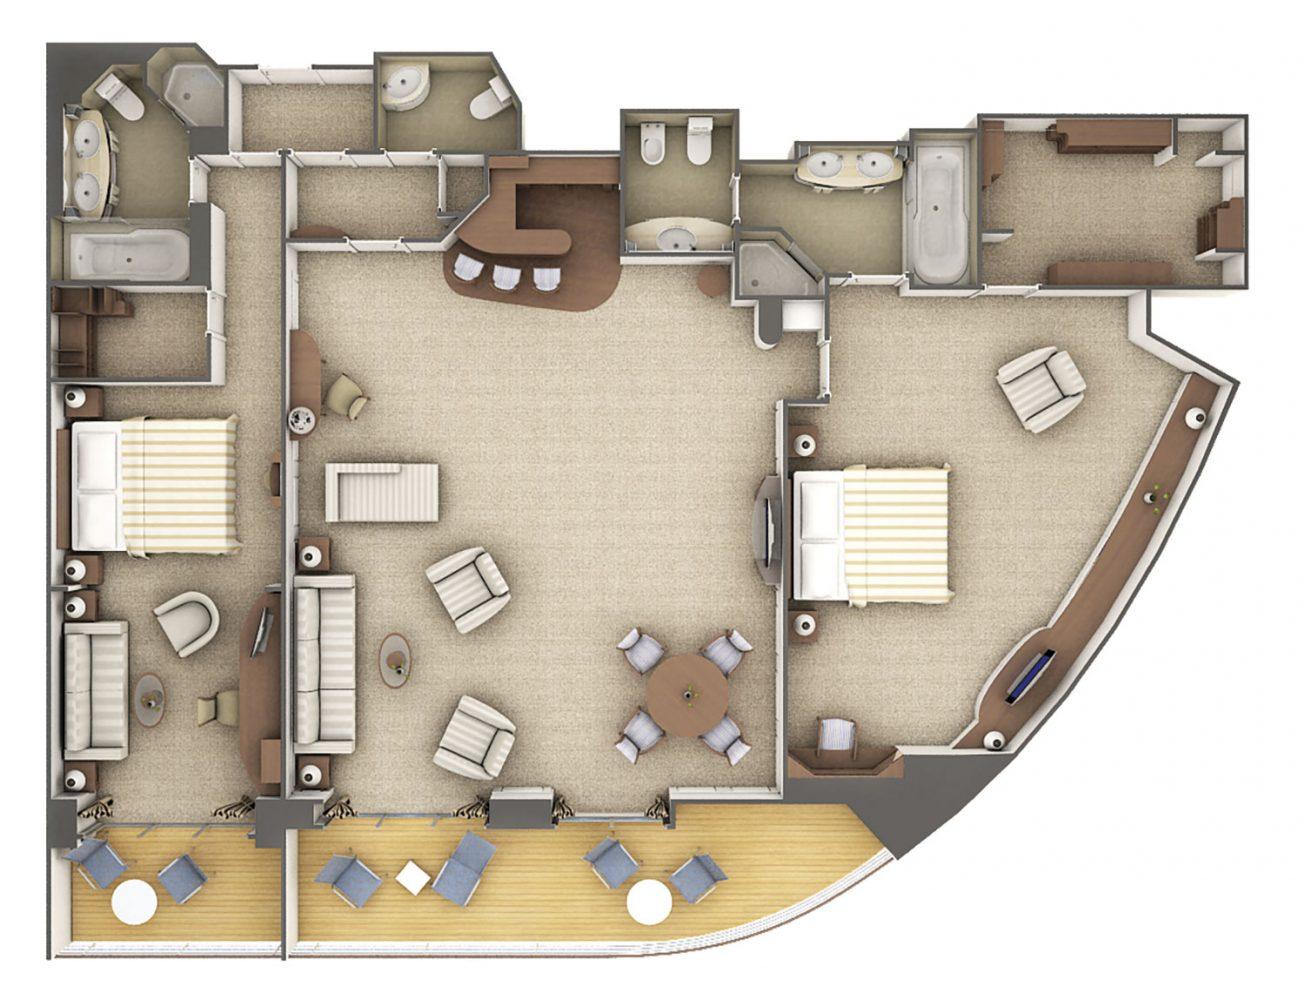 Grand Suite - Silver Whisper - Grand Suite G1 / G2 2 Schlafzimmer - Silver Whisper - Bild 5 - Grundriss Thumb